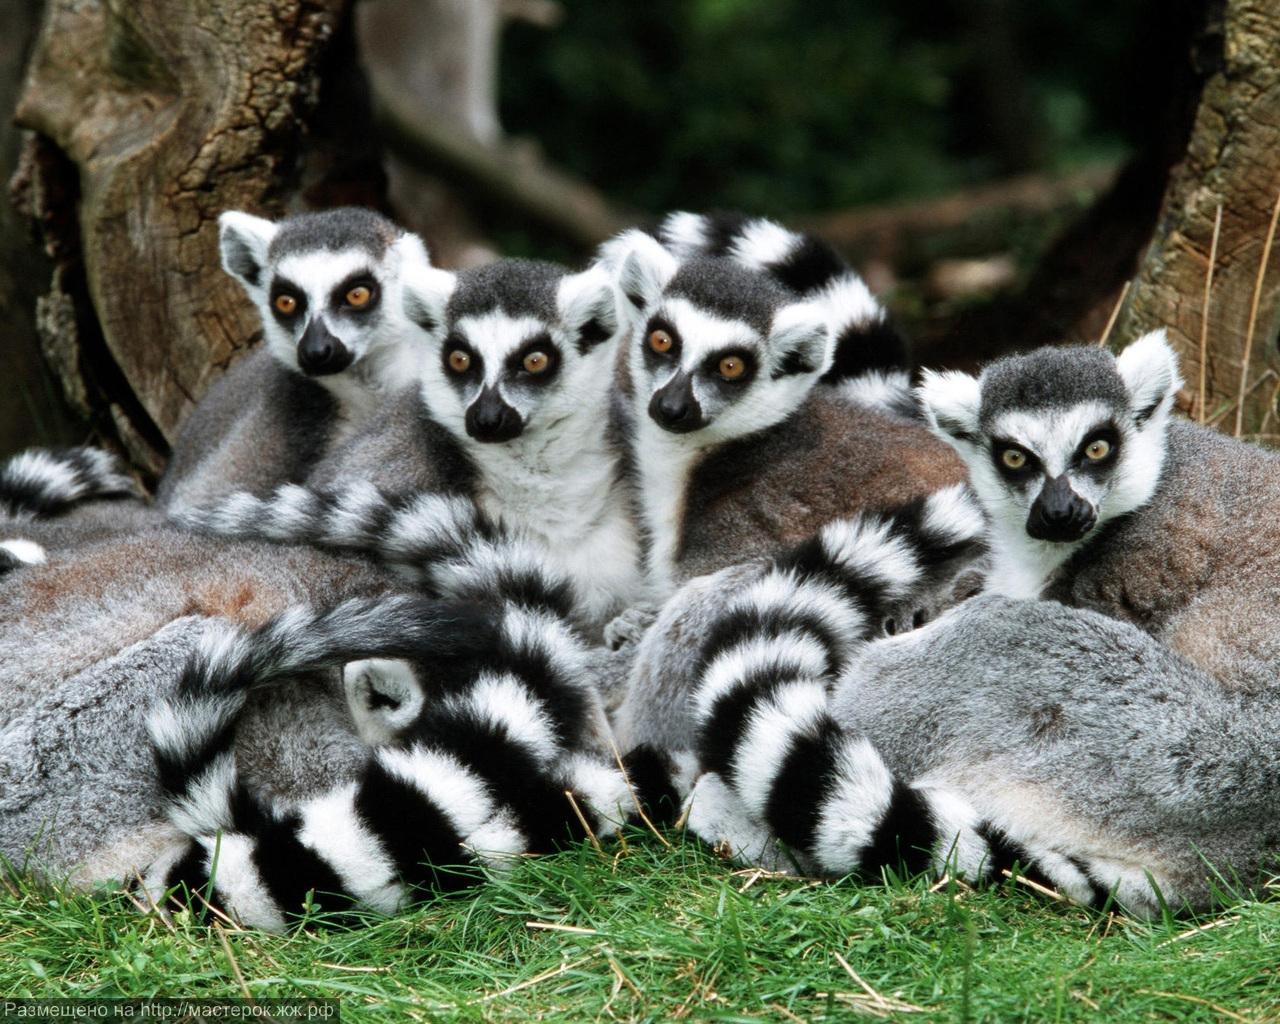 Katta - Gruppe<br />lemur katta<br />ring-tailed lemur